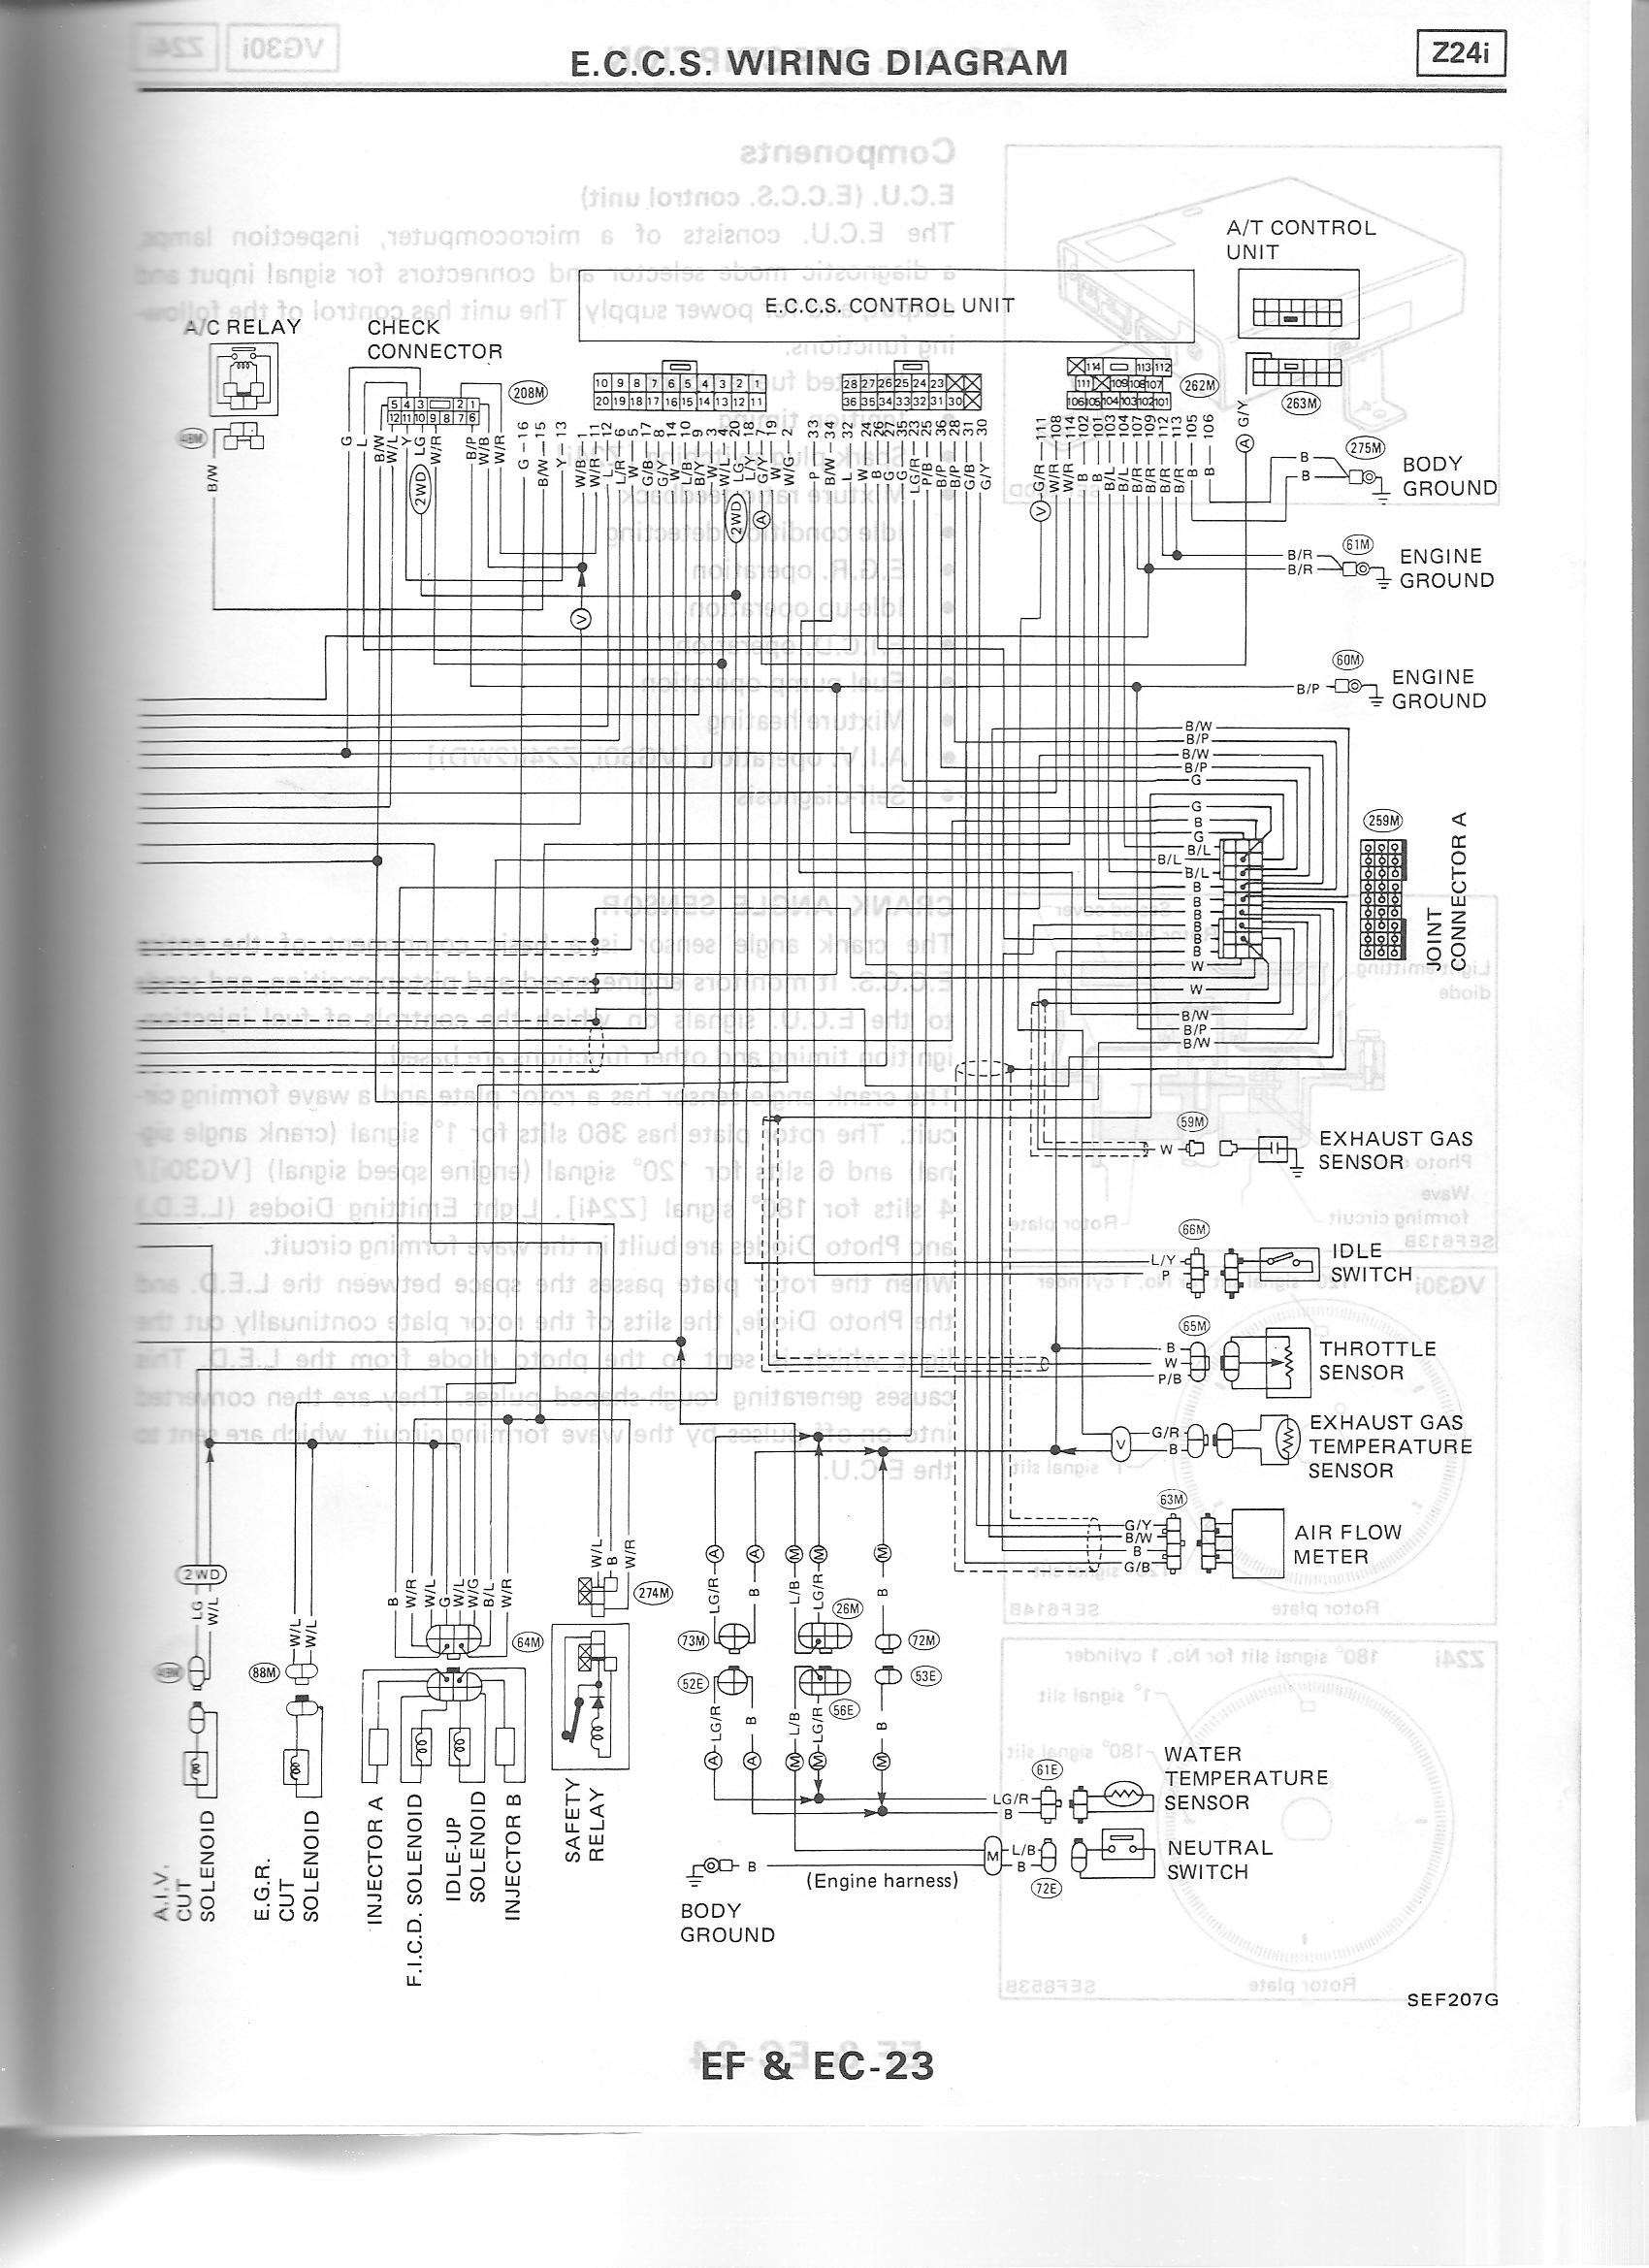 1989 Nissan Pathfinder Wiring Diagram Wiring Diagram Modernize Modernize Frankmotors Es